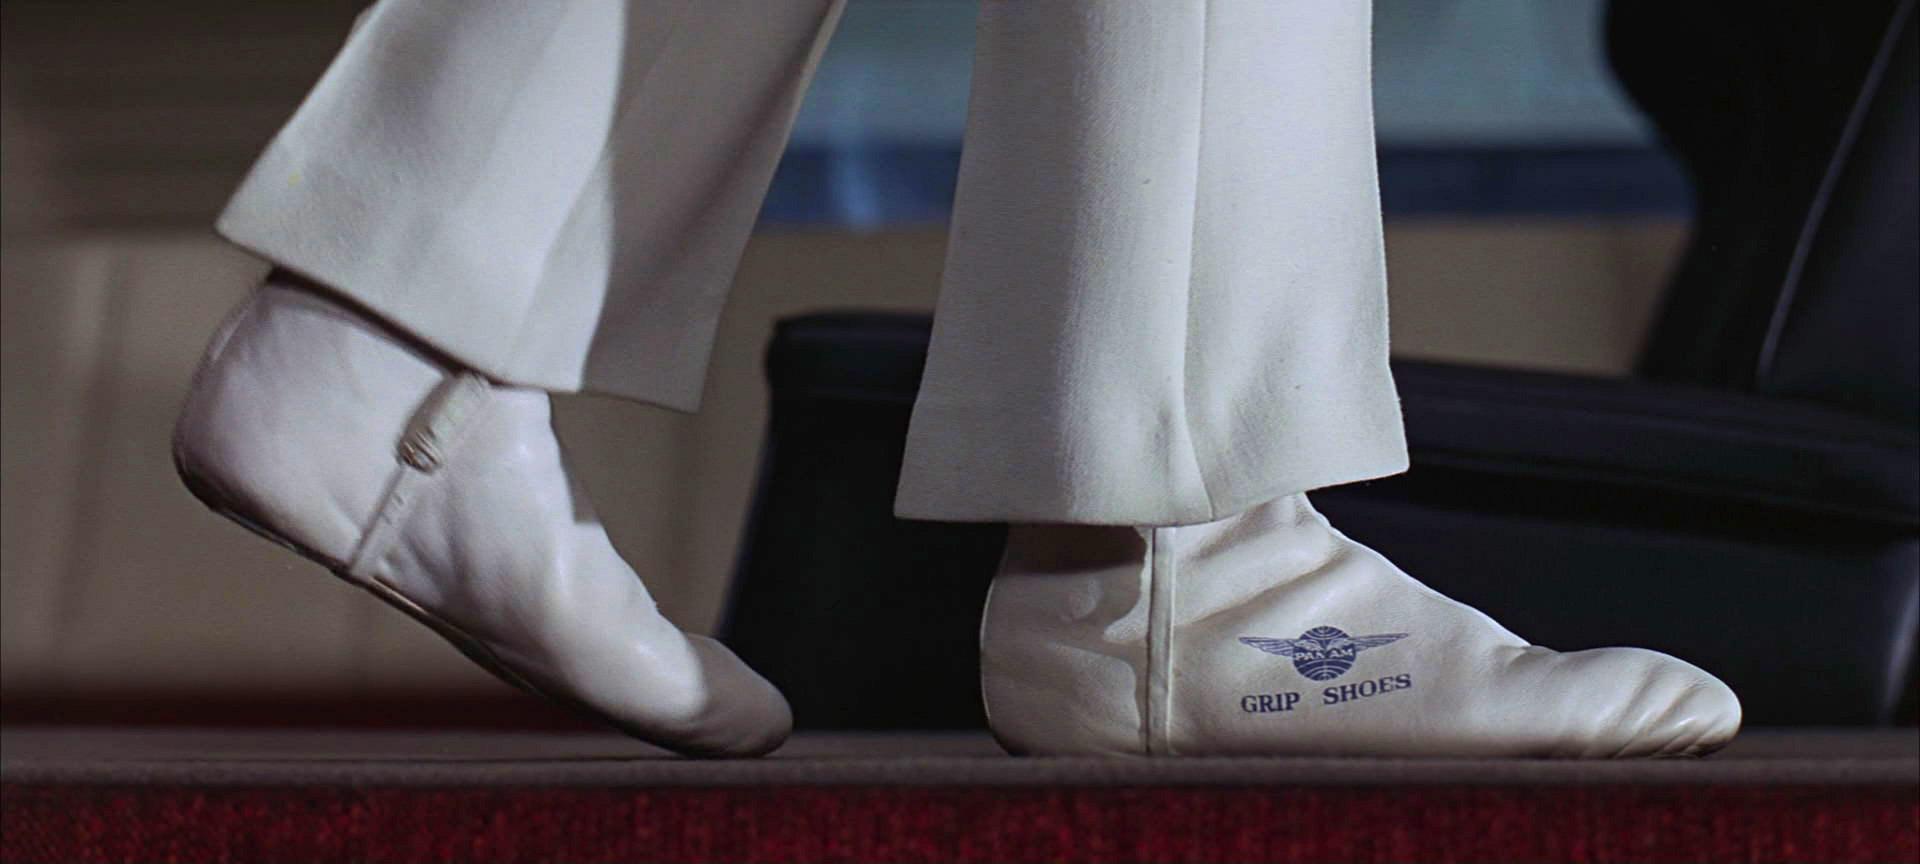 Stewardess grip shoes_01.jpg